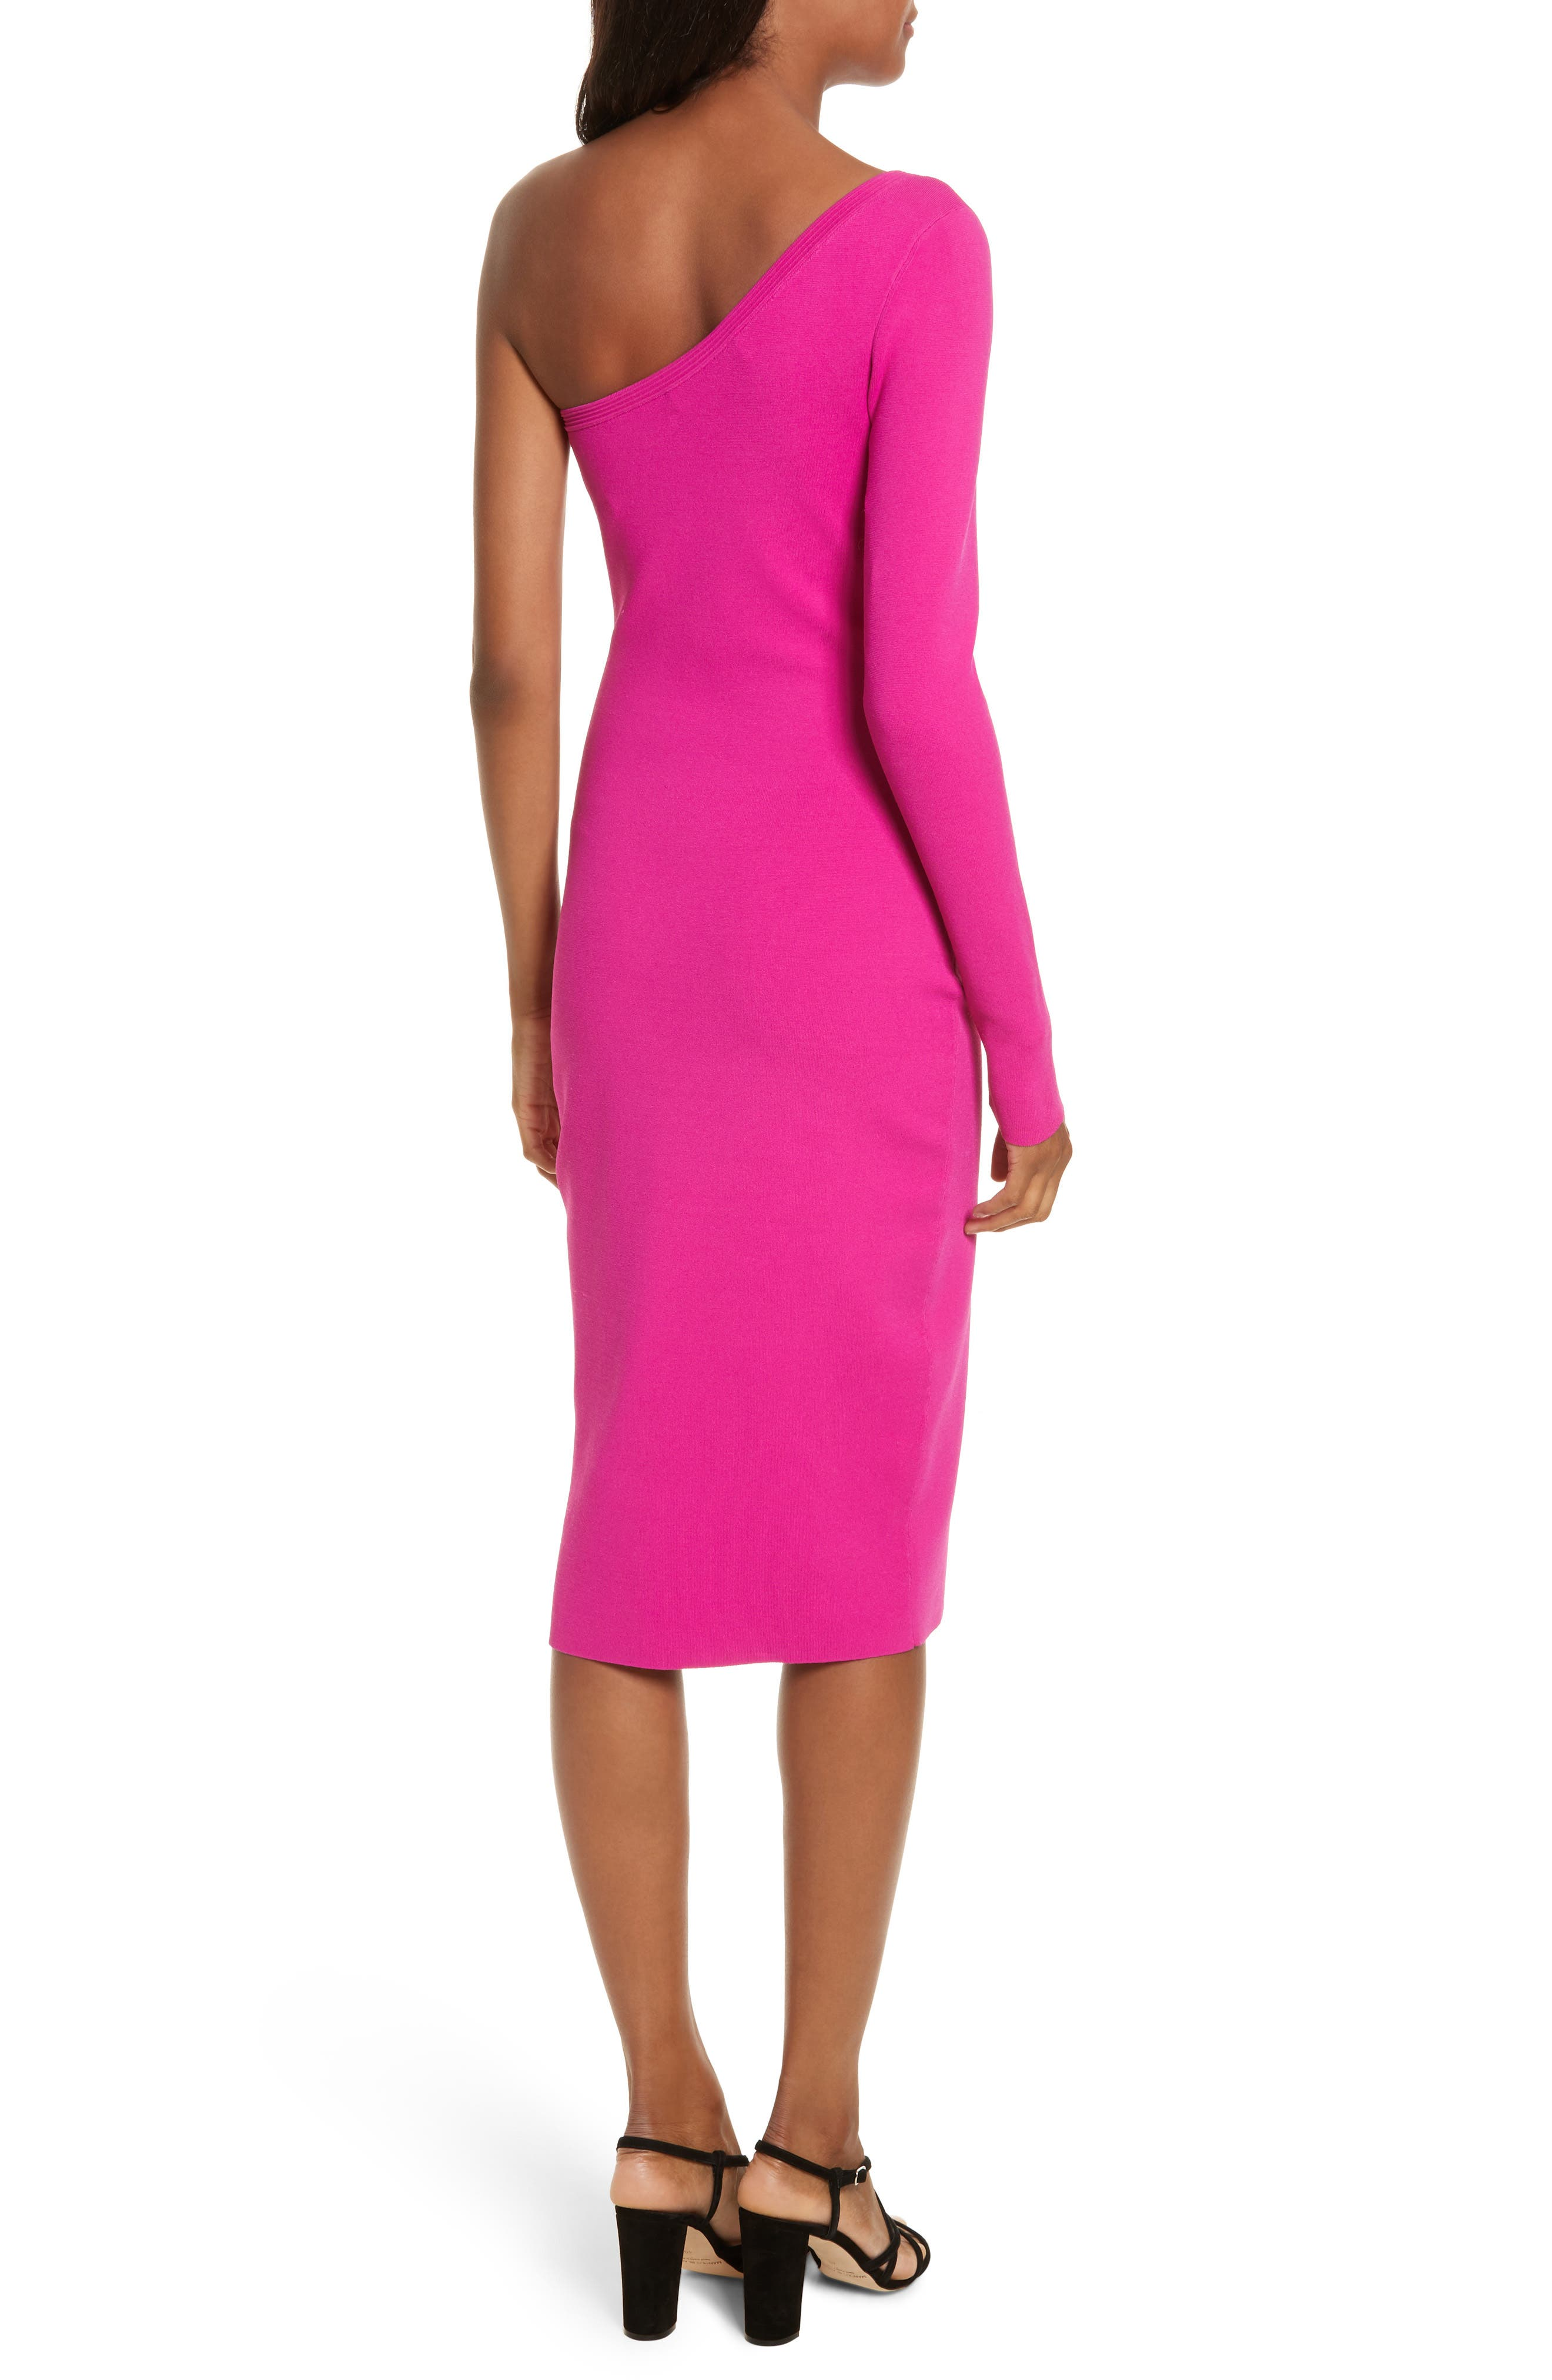 Diane von Furstenberg Knit One-Shoulder Midi Dress,                             Alternate thumbnail 2, color,                             666